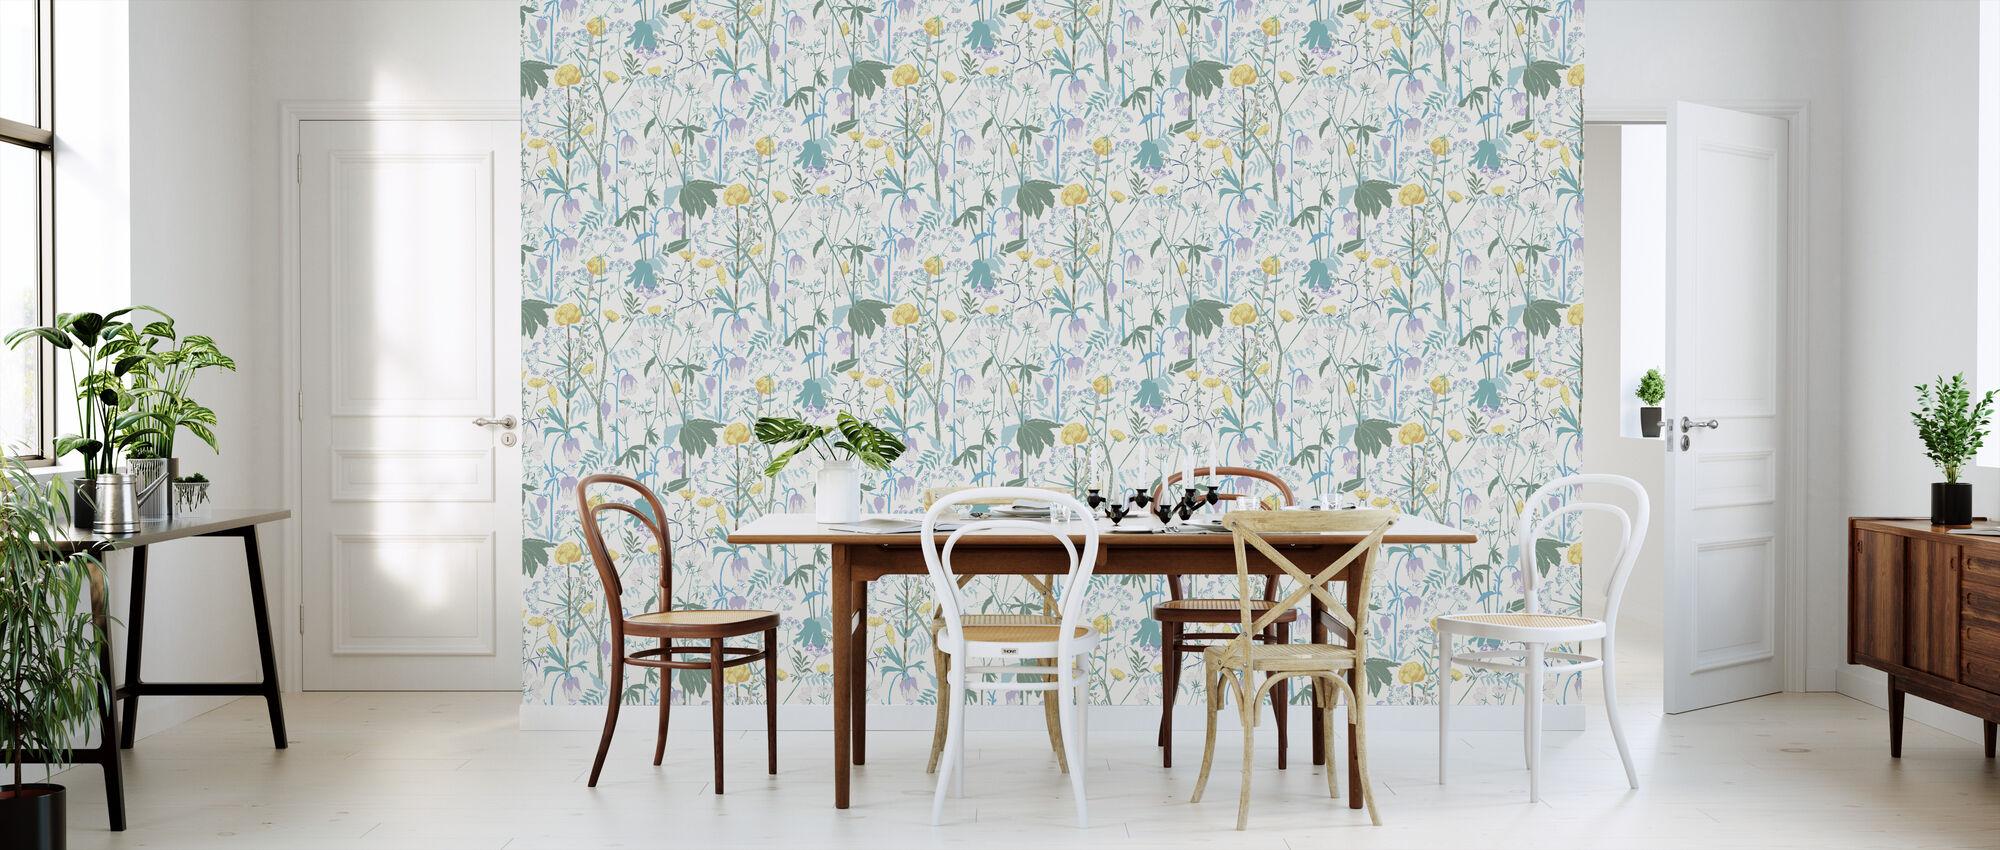 Summer Meadow - Blue - Wallpaper - Kitchen